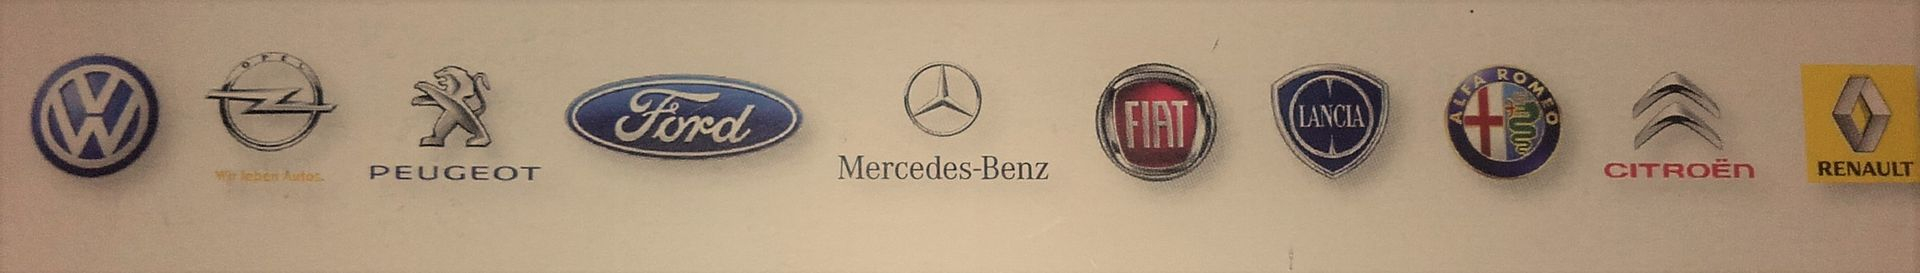 alle Marken VW, Audi, Mercedes, Opel, Fiat, Ford, Seat, Chevrolet, Mazda, Hyundai, Toyota, Nissan,...